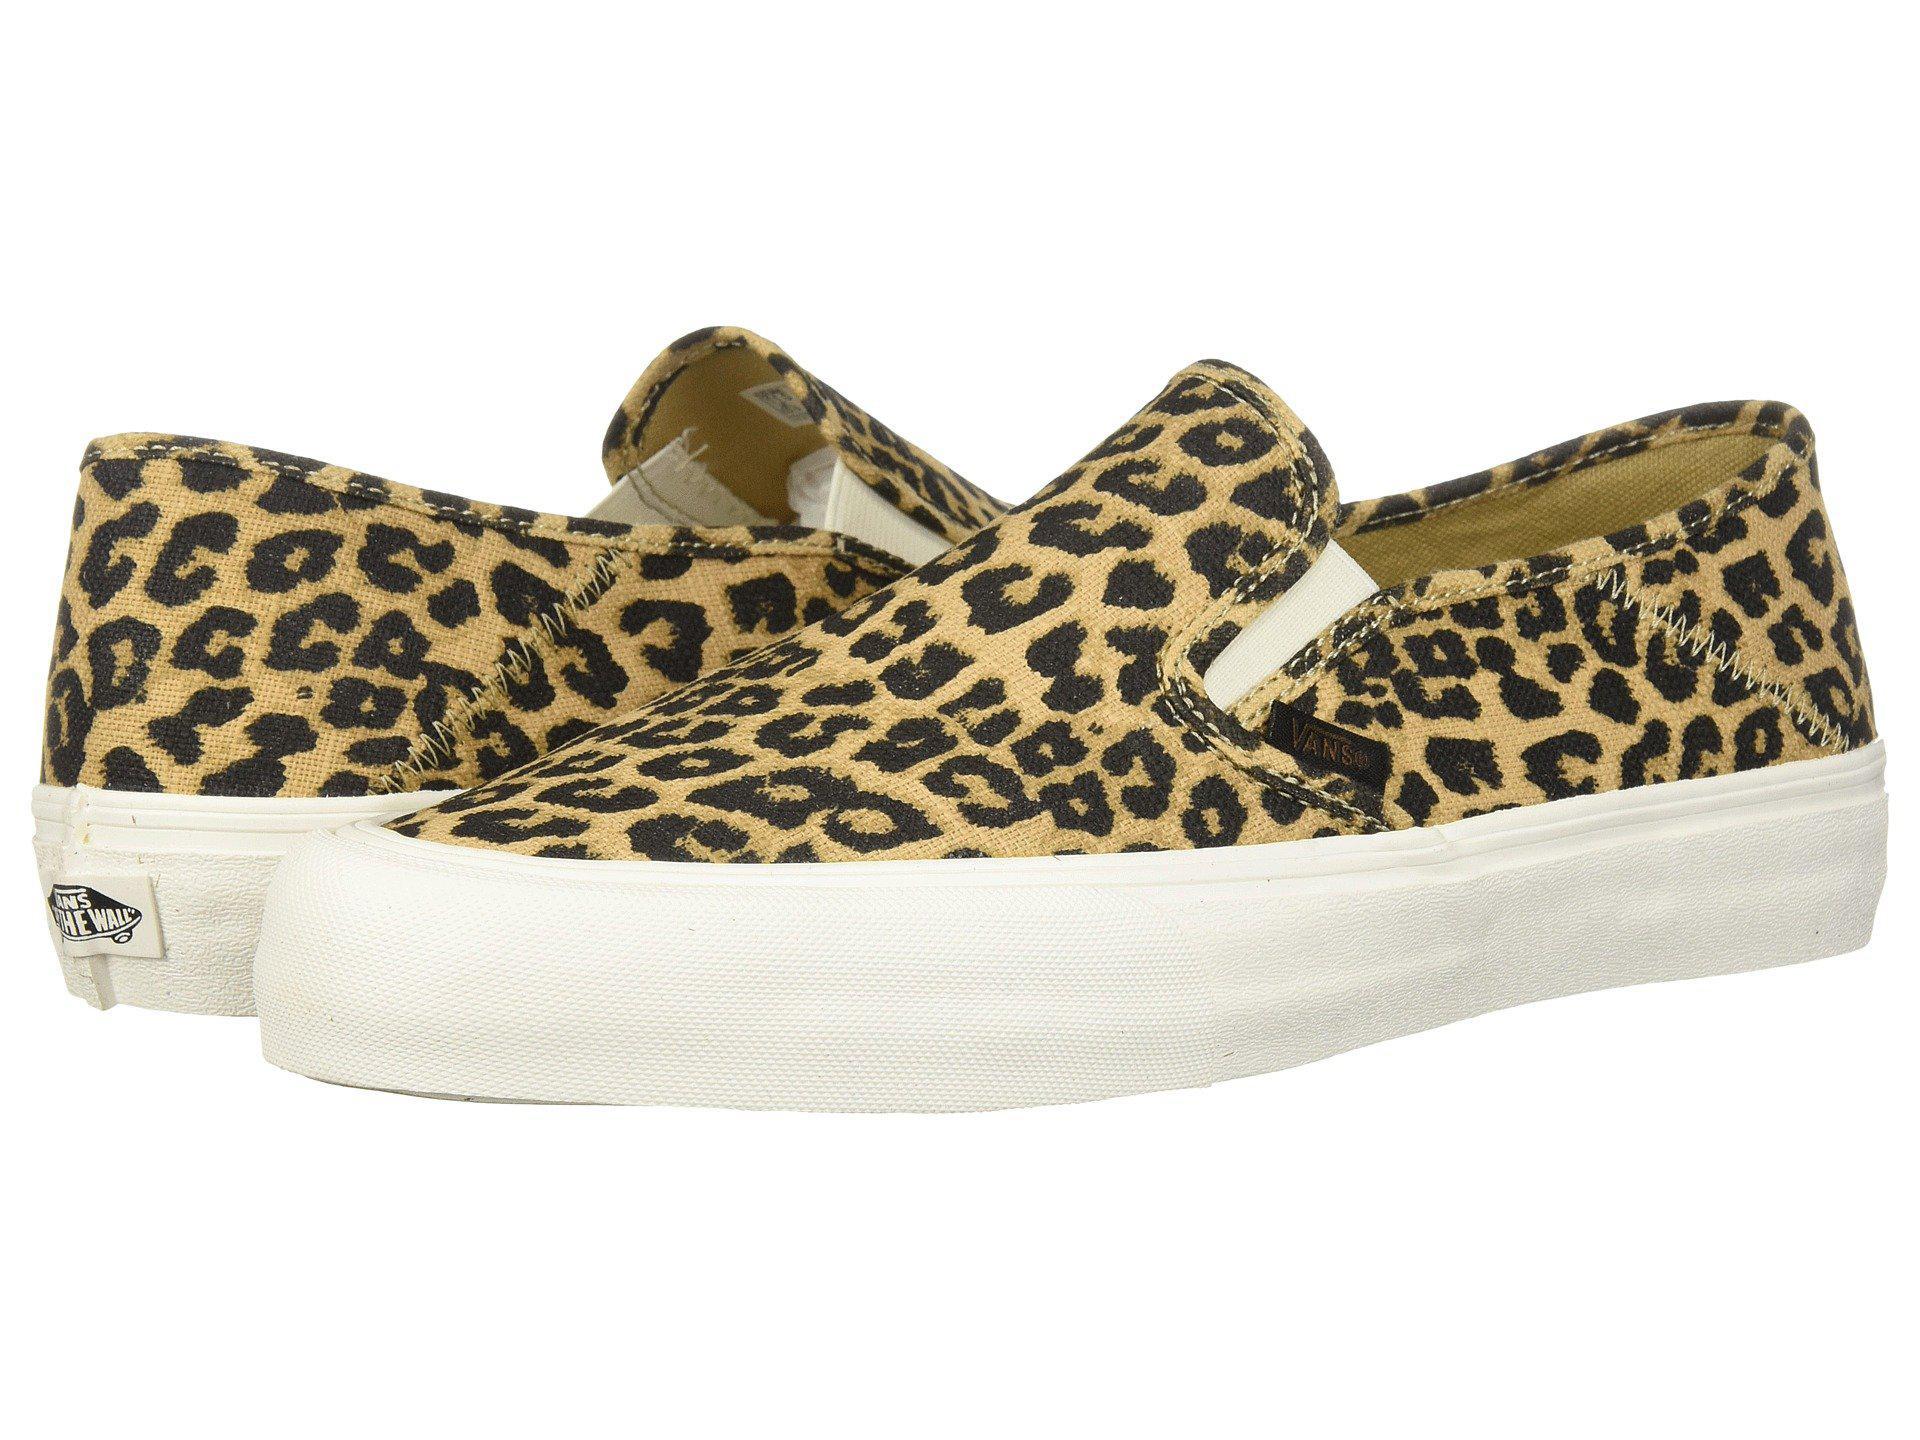 f5fe1f7172a391 Lyst - Vans Slip-on Sf ((hemp) Leopard  18) Skate Shoes